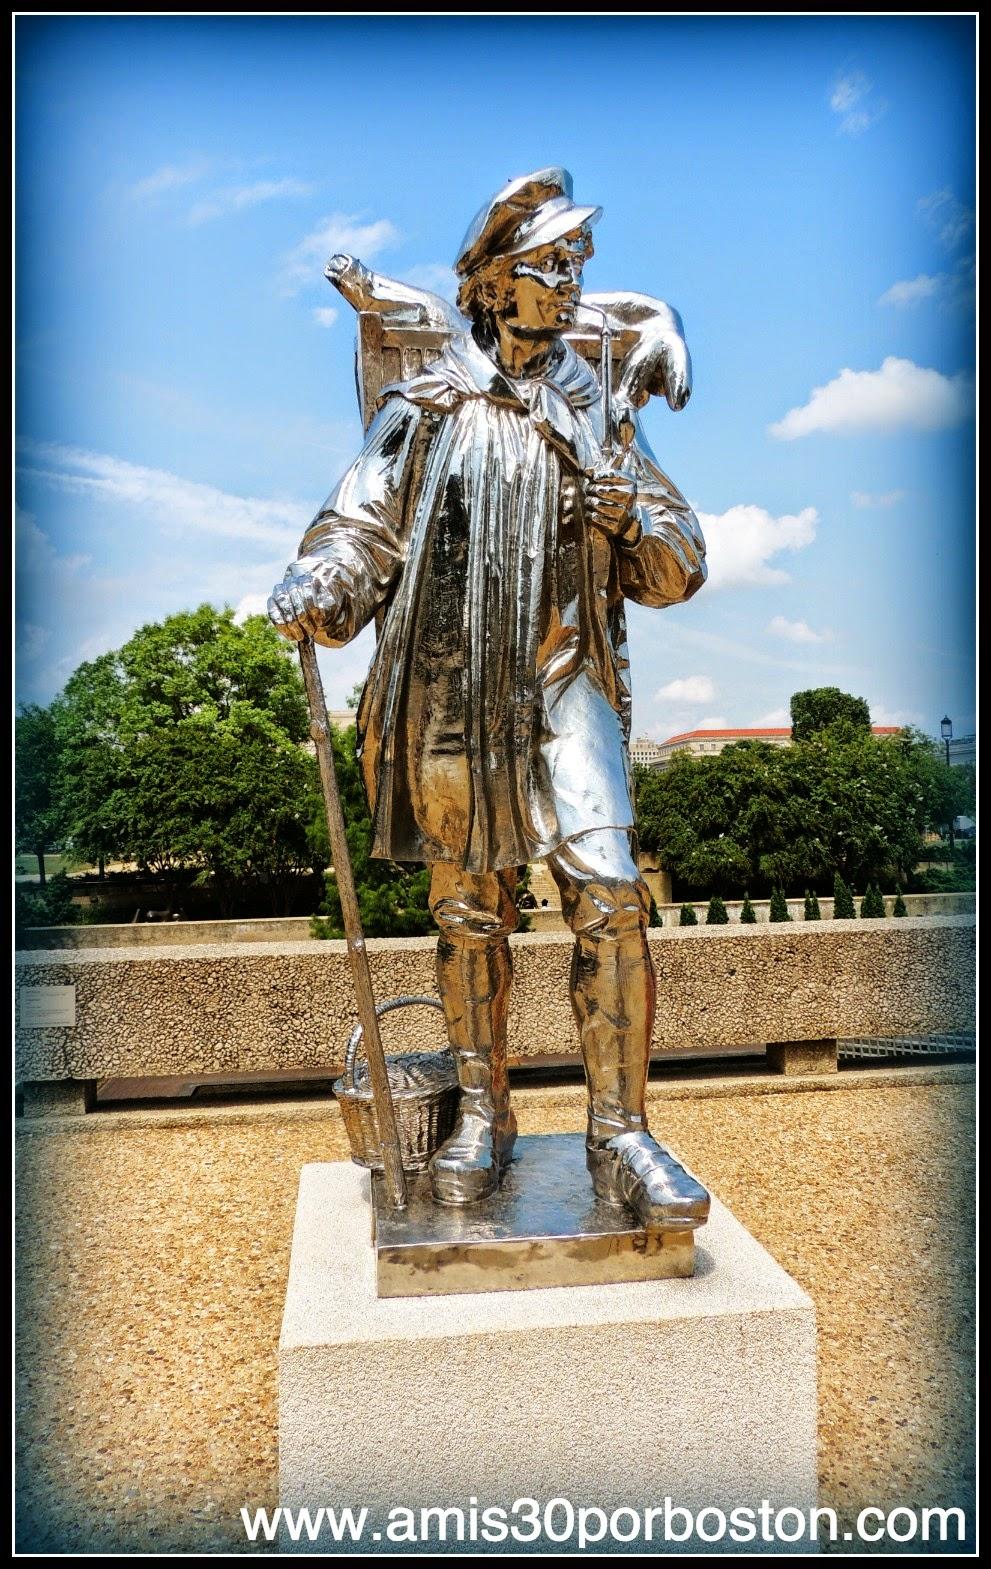 Kiepenkerl Statue